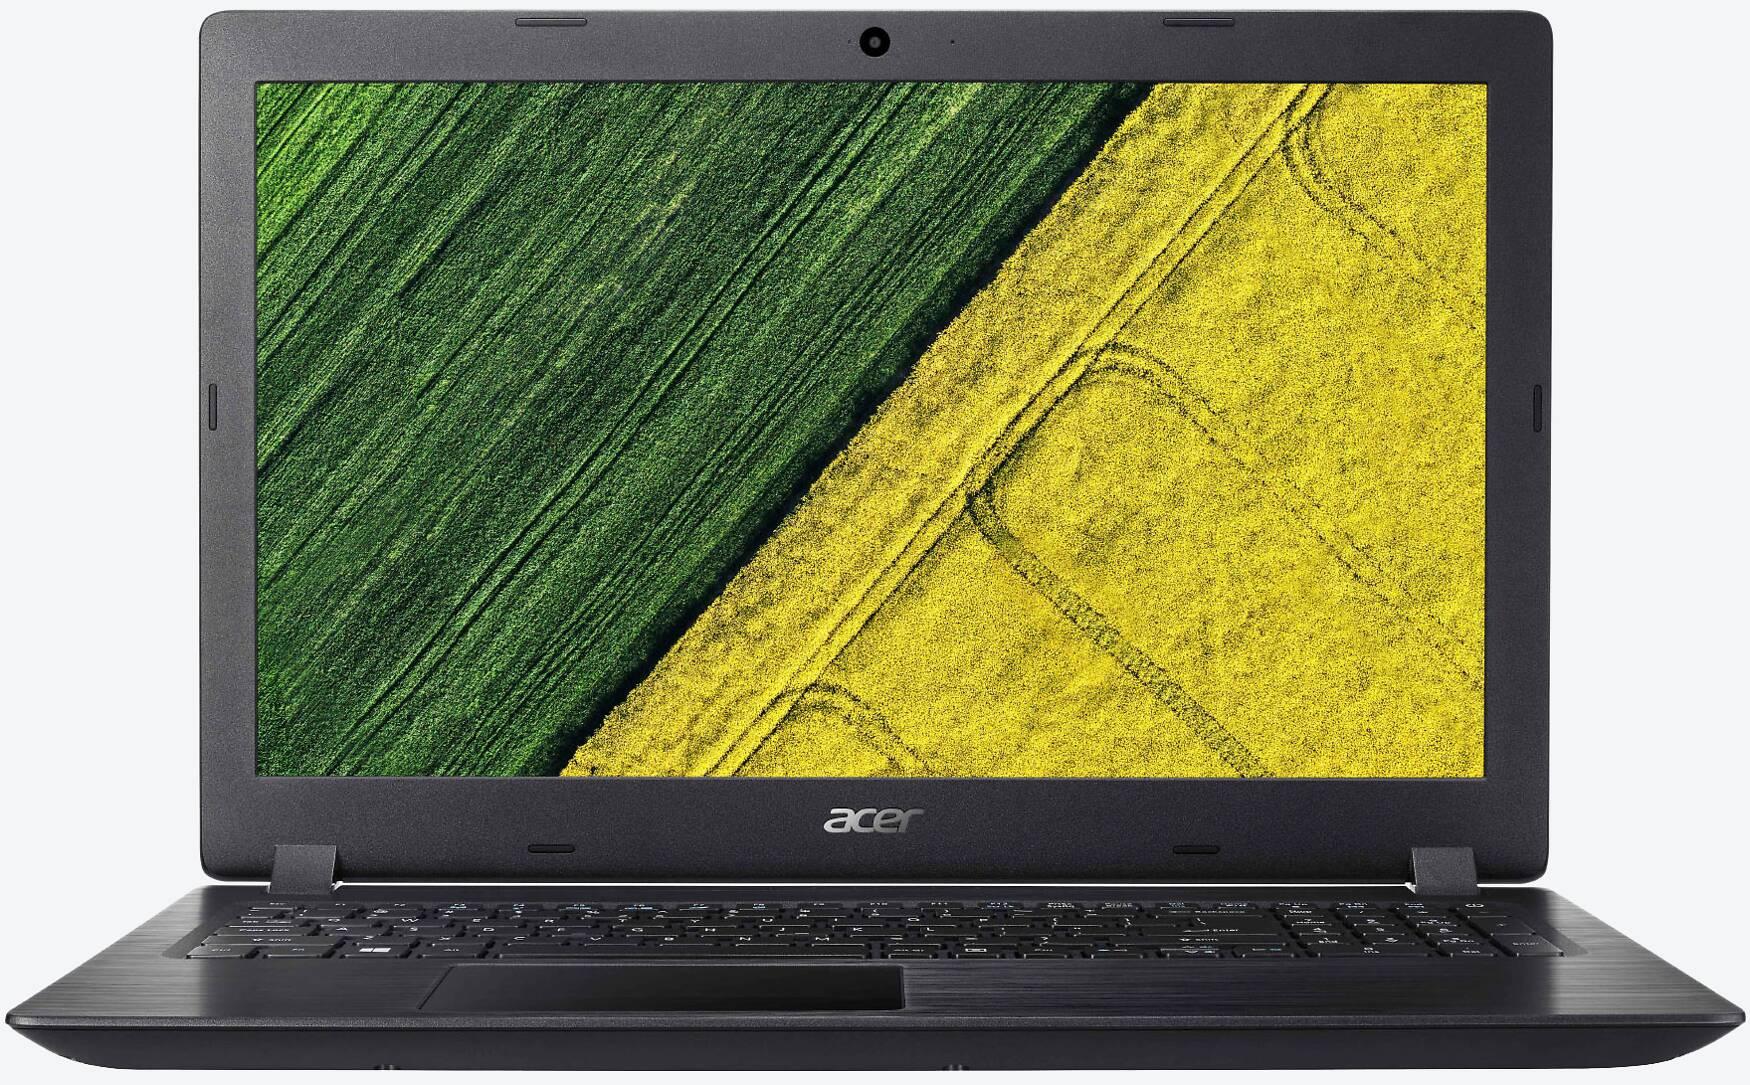 Acer Aspire 3 A315-53-38YC